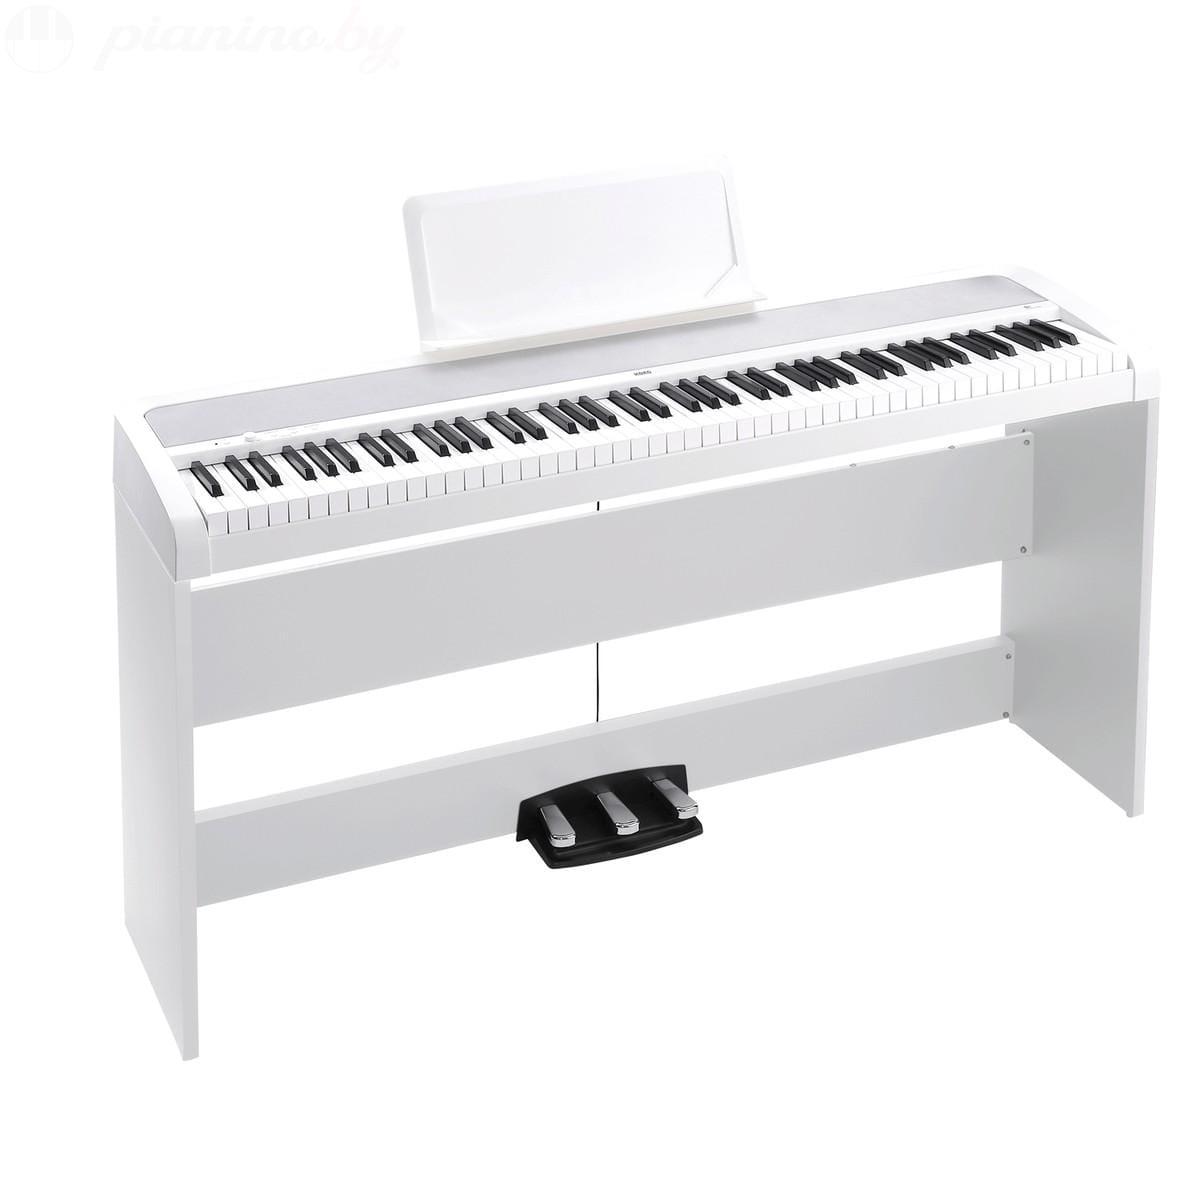 Цифровое пианино Korg B1SP-WH Фото 1